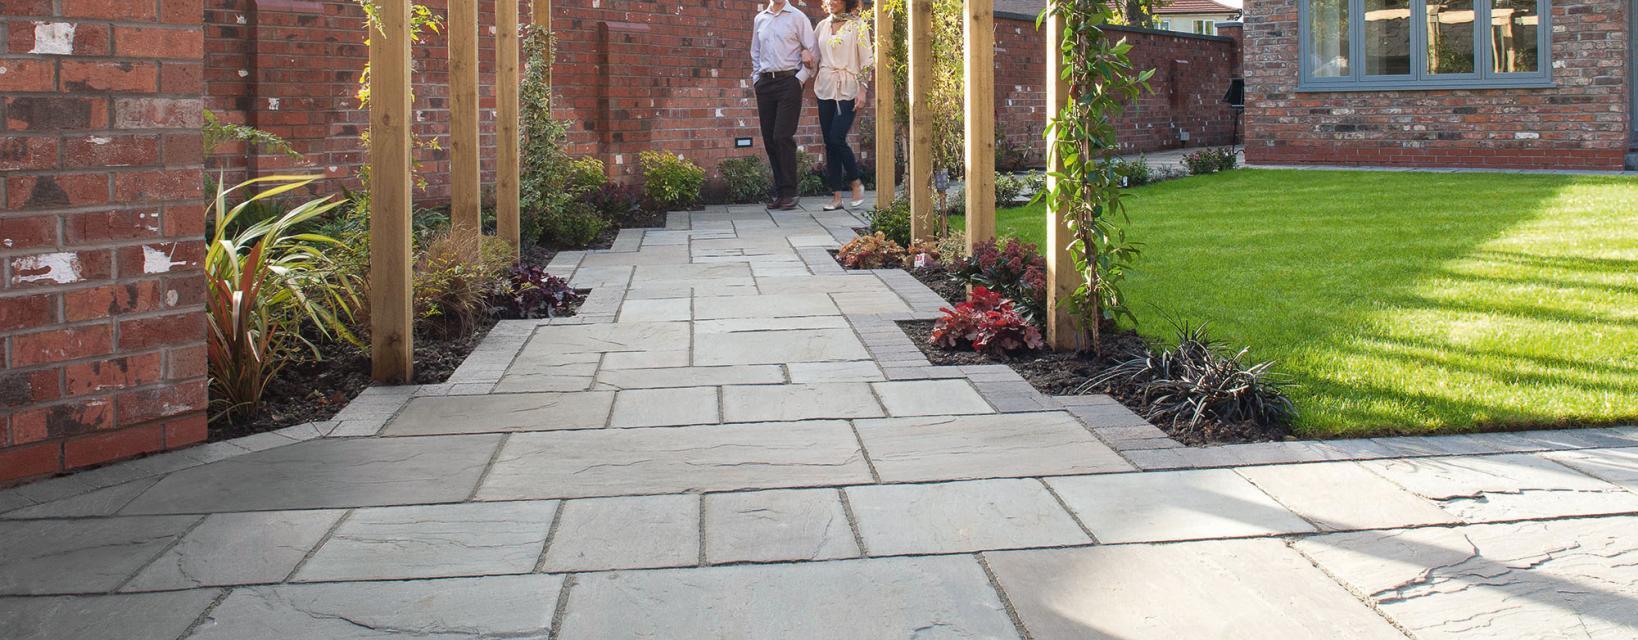 sylvern patio with tegula block edging